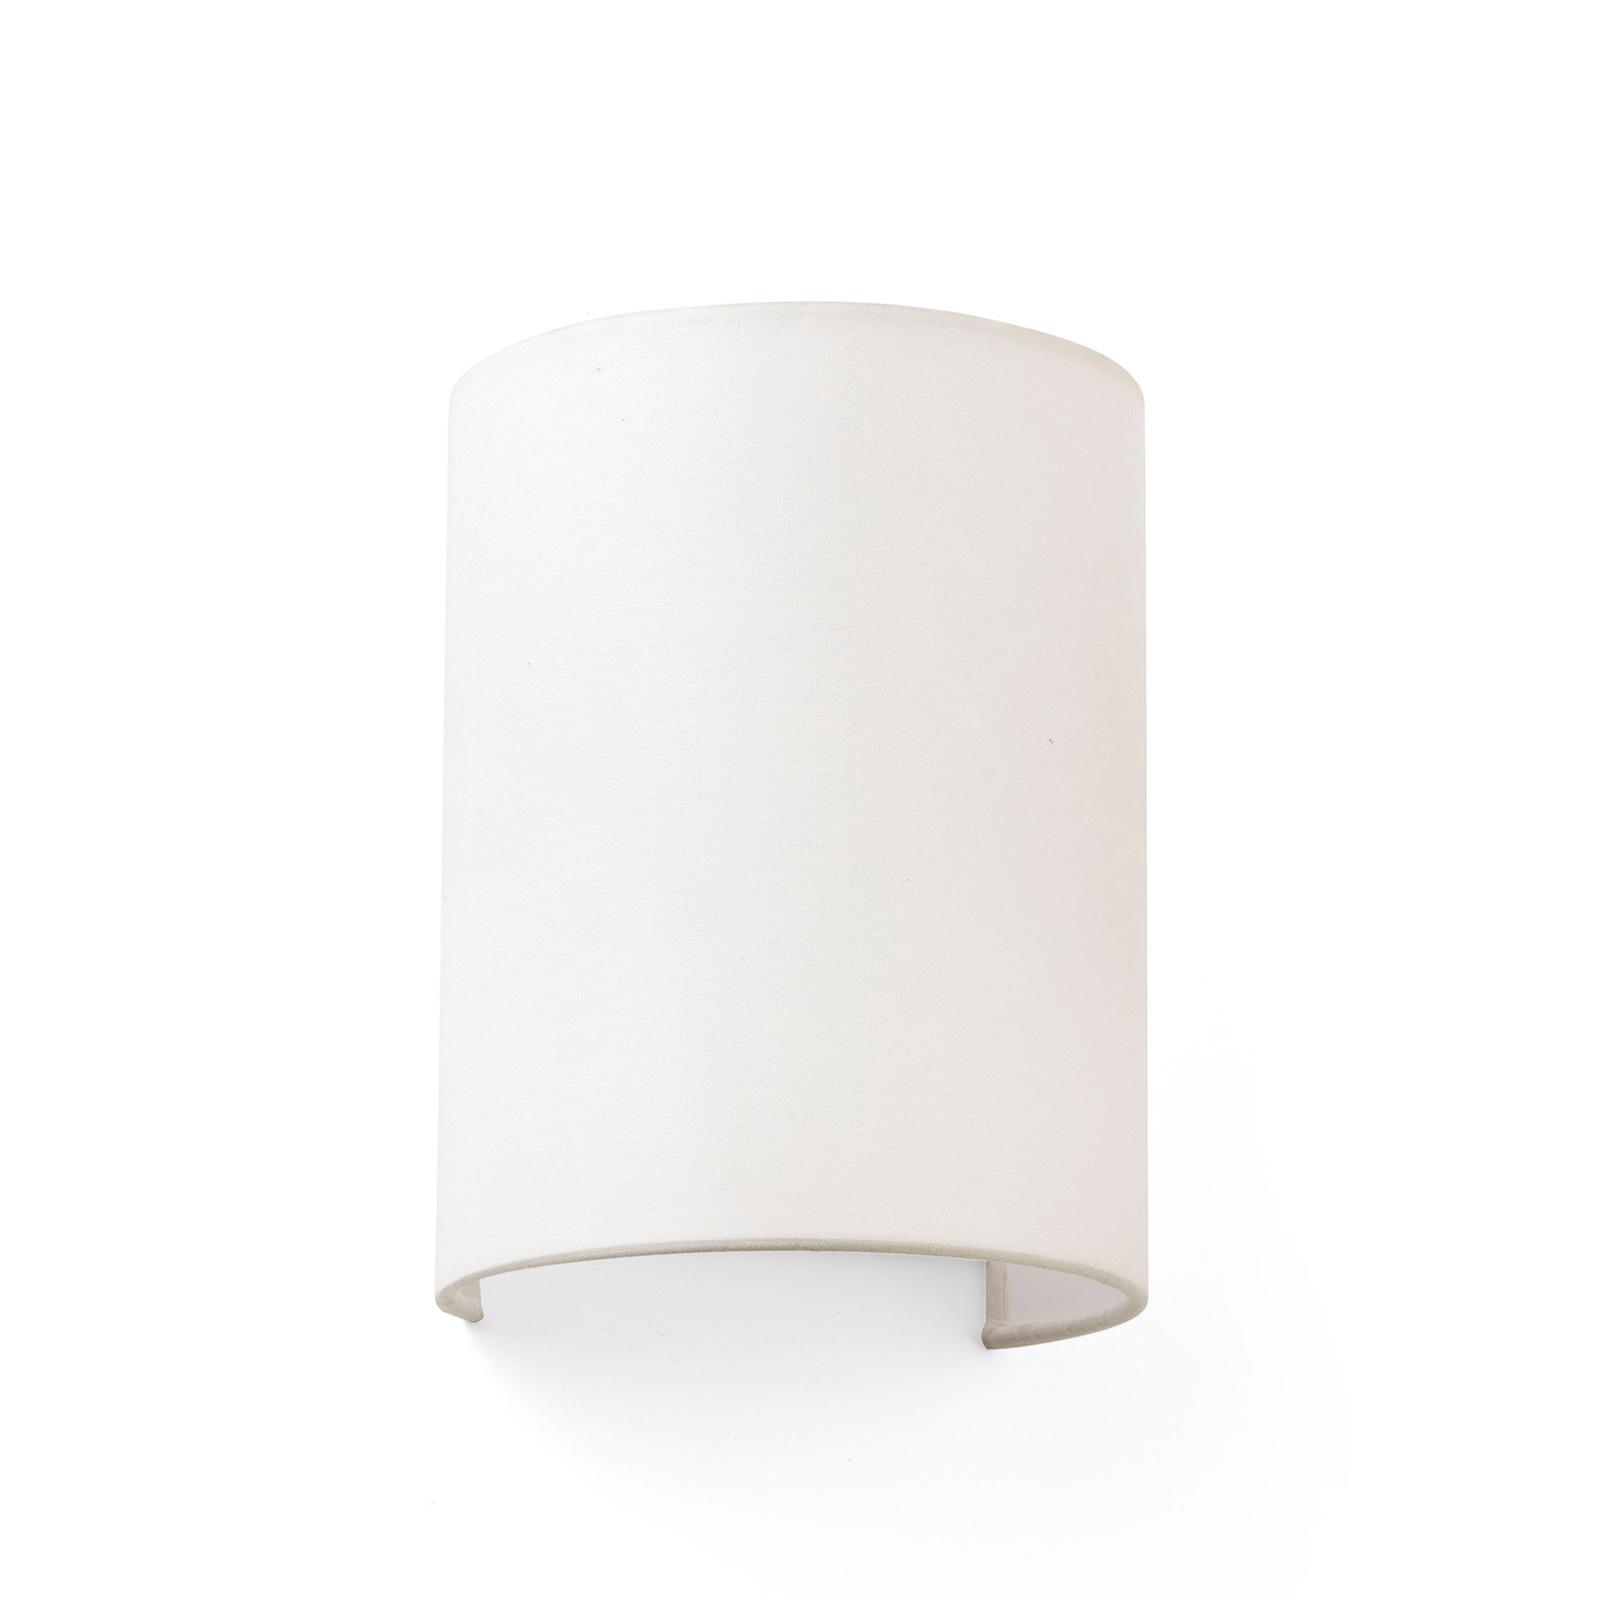 Wandlamp Cotton, gewelfd, 20 x 15 cm, beige